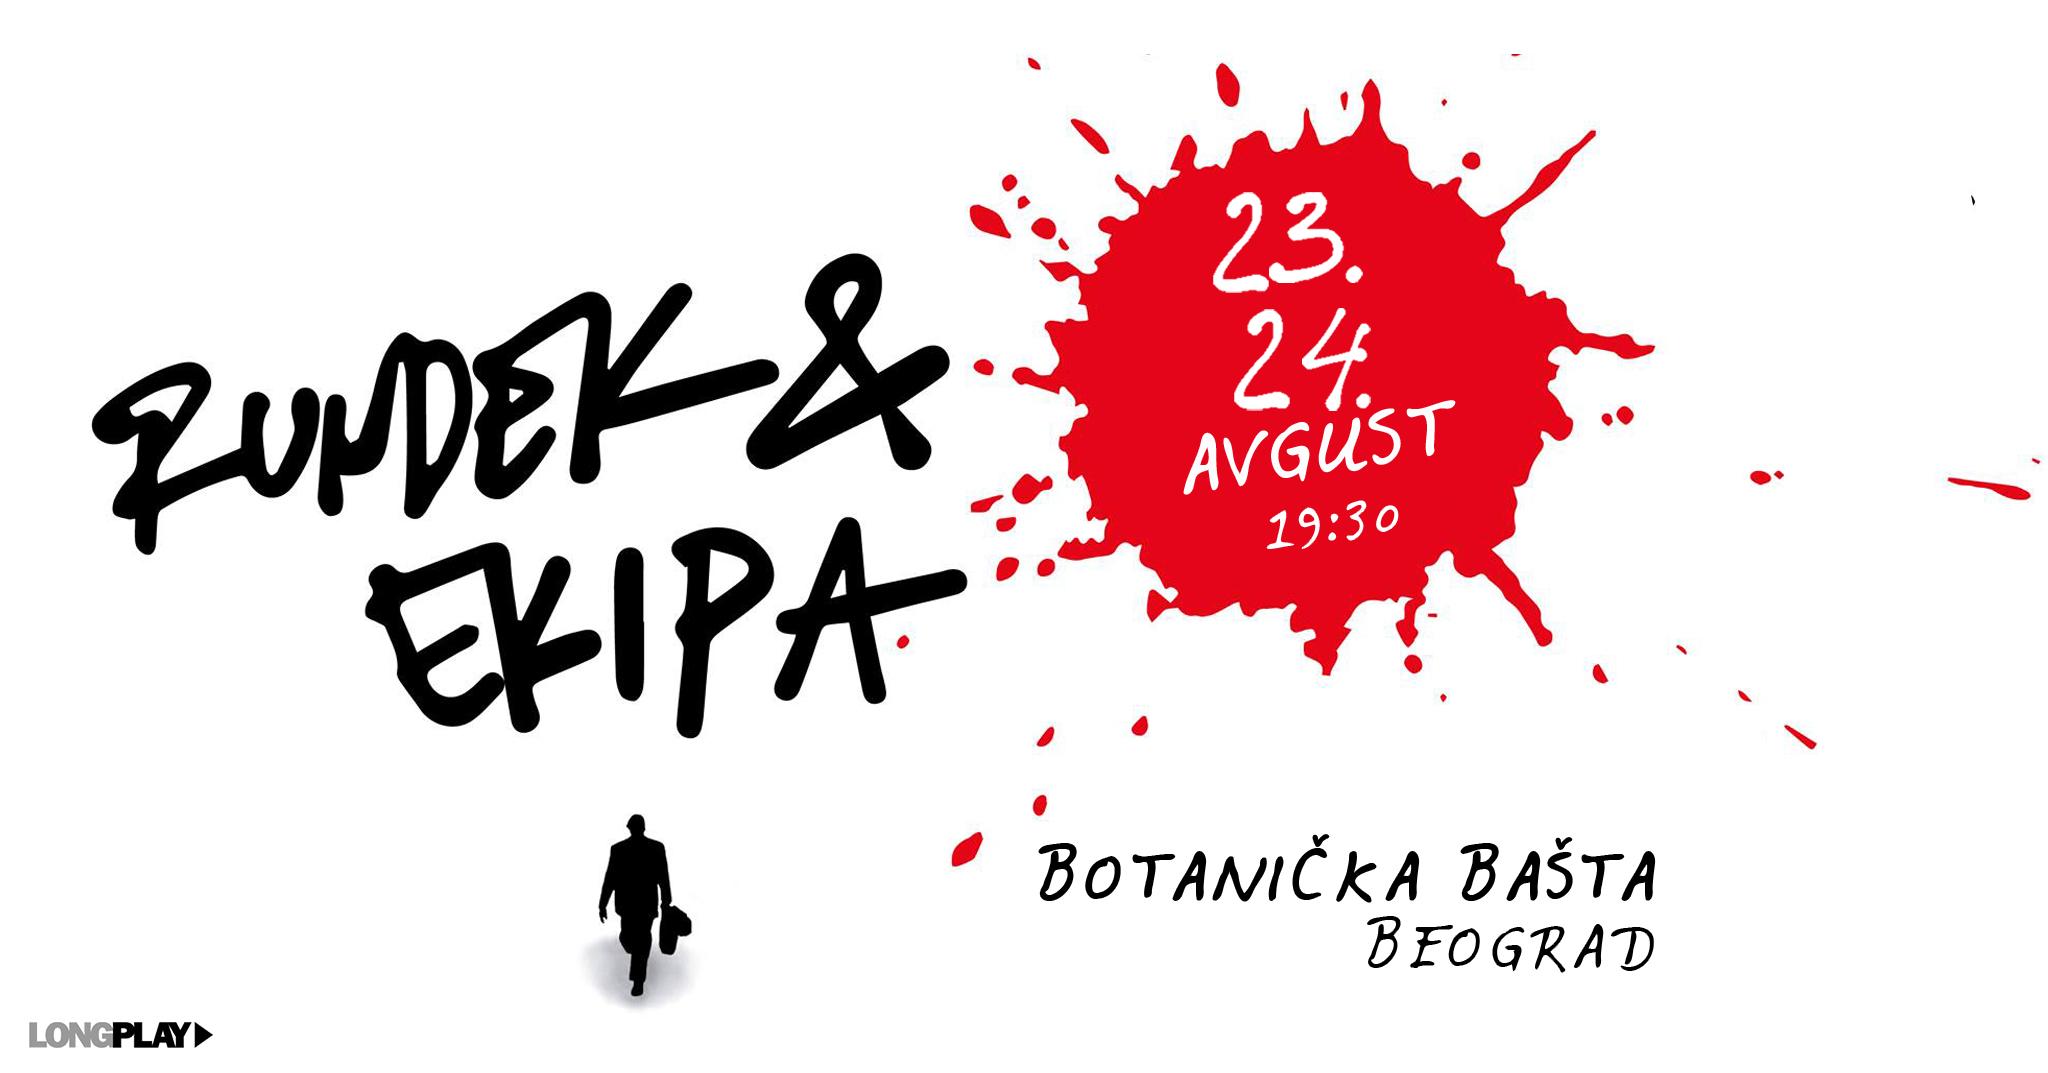 Rundek & Ekipa u Botaničkoj bašti • 23. i 24.avgust